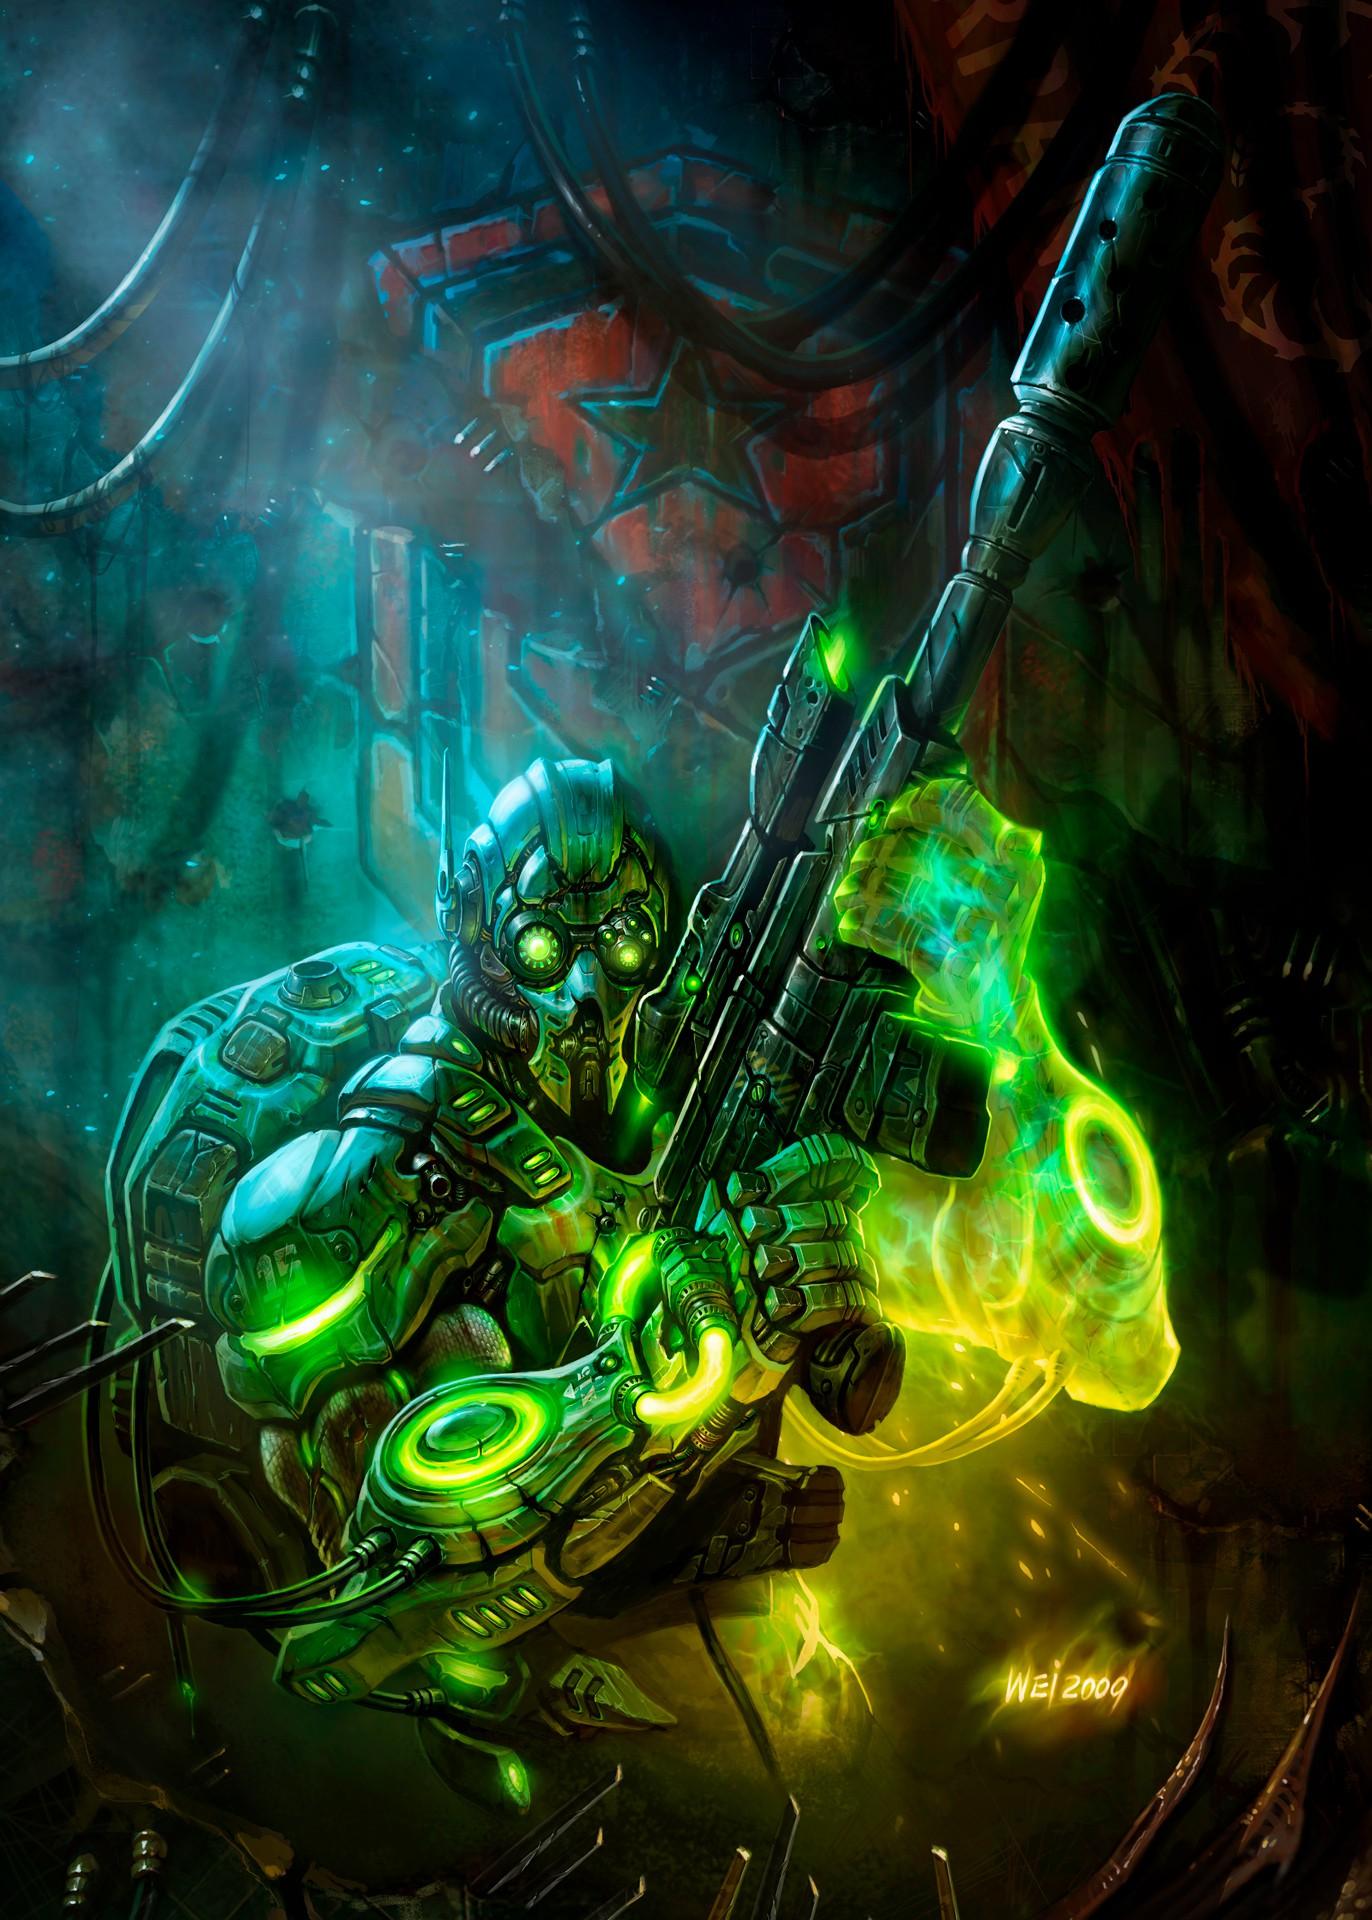 Artwork Ghost Starcraft Blizzard Entertainment Cook And Becker